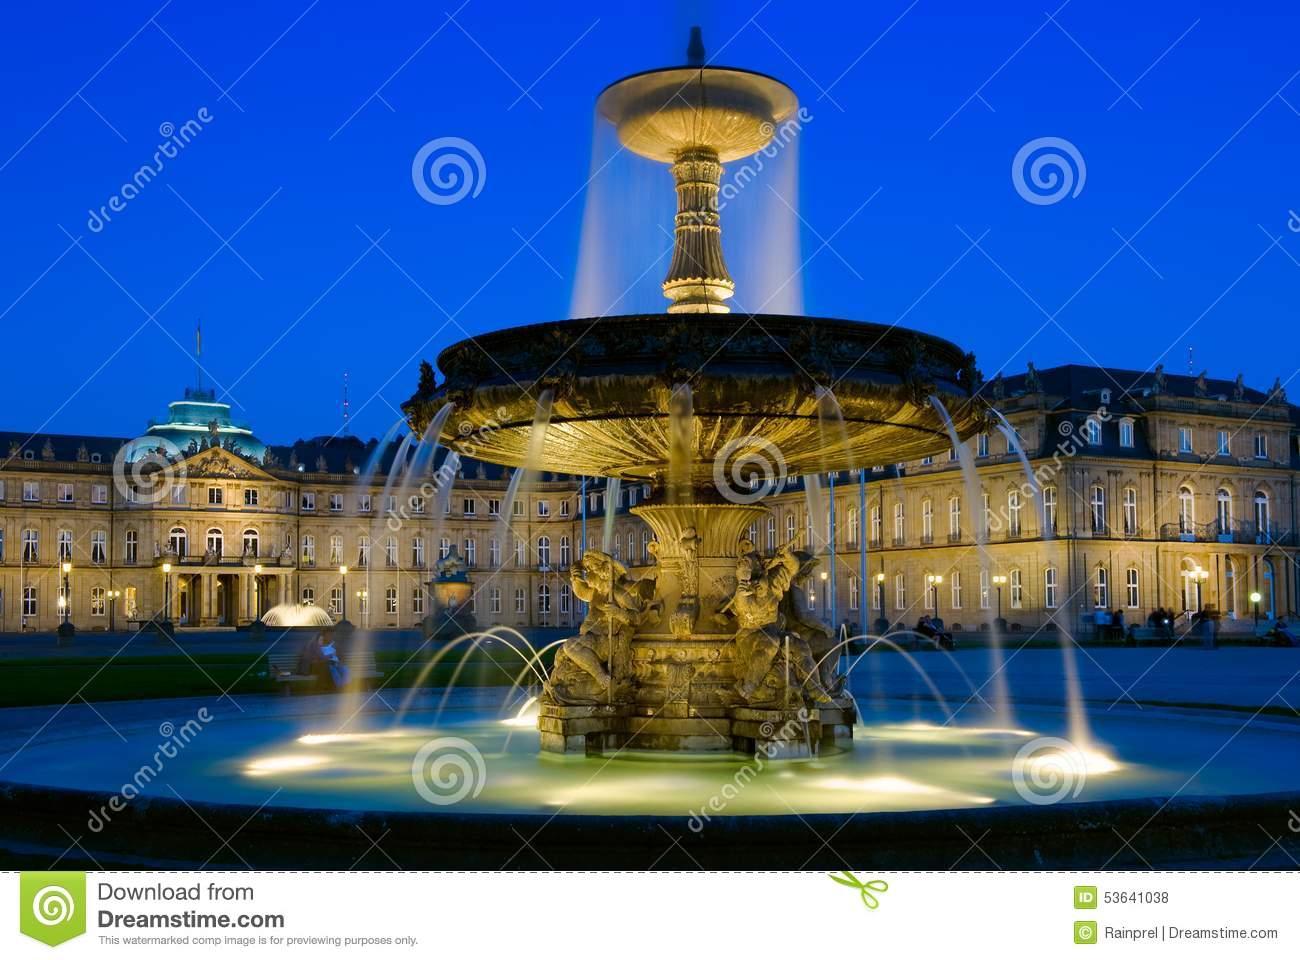 Schlossplatz Fountain In Stuttgart, Germany Stock Photo.